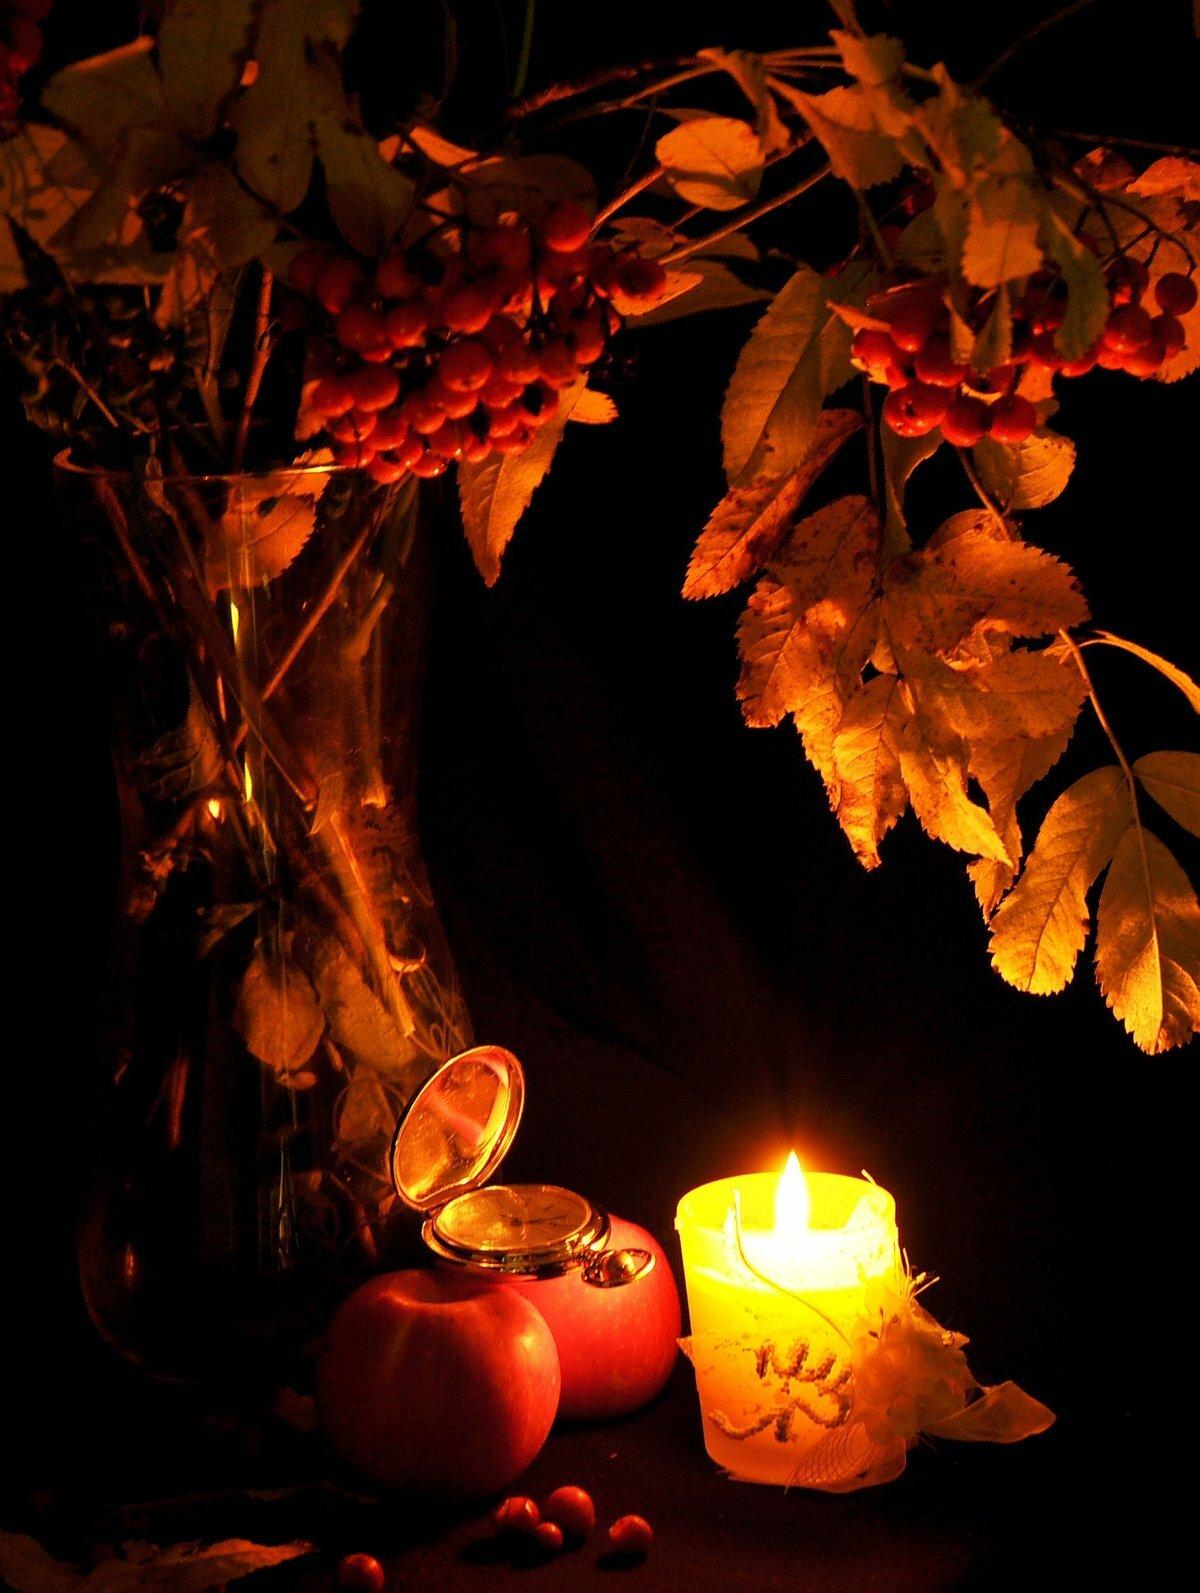 картинки красивого вам осеннего вечера танк, ржавеющий